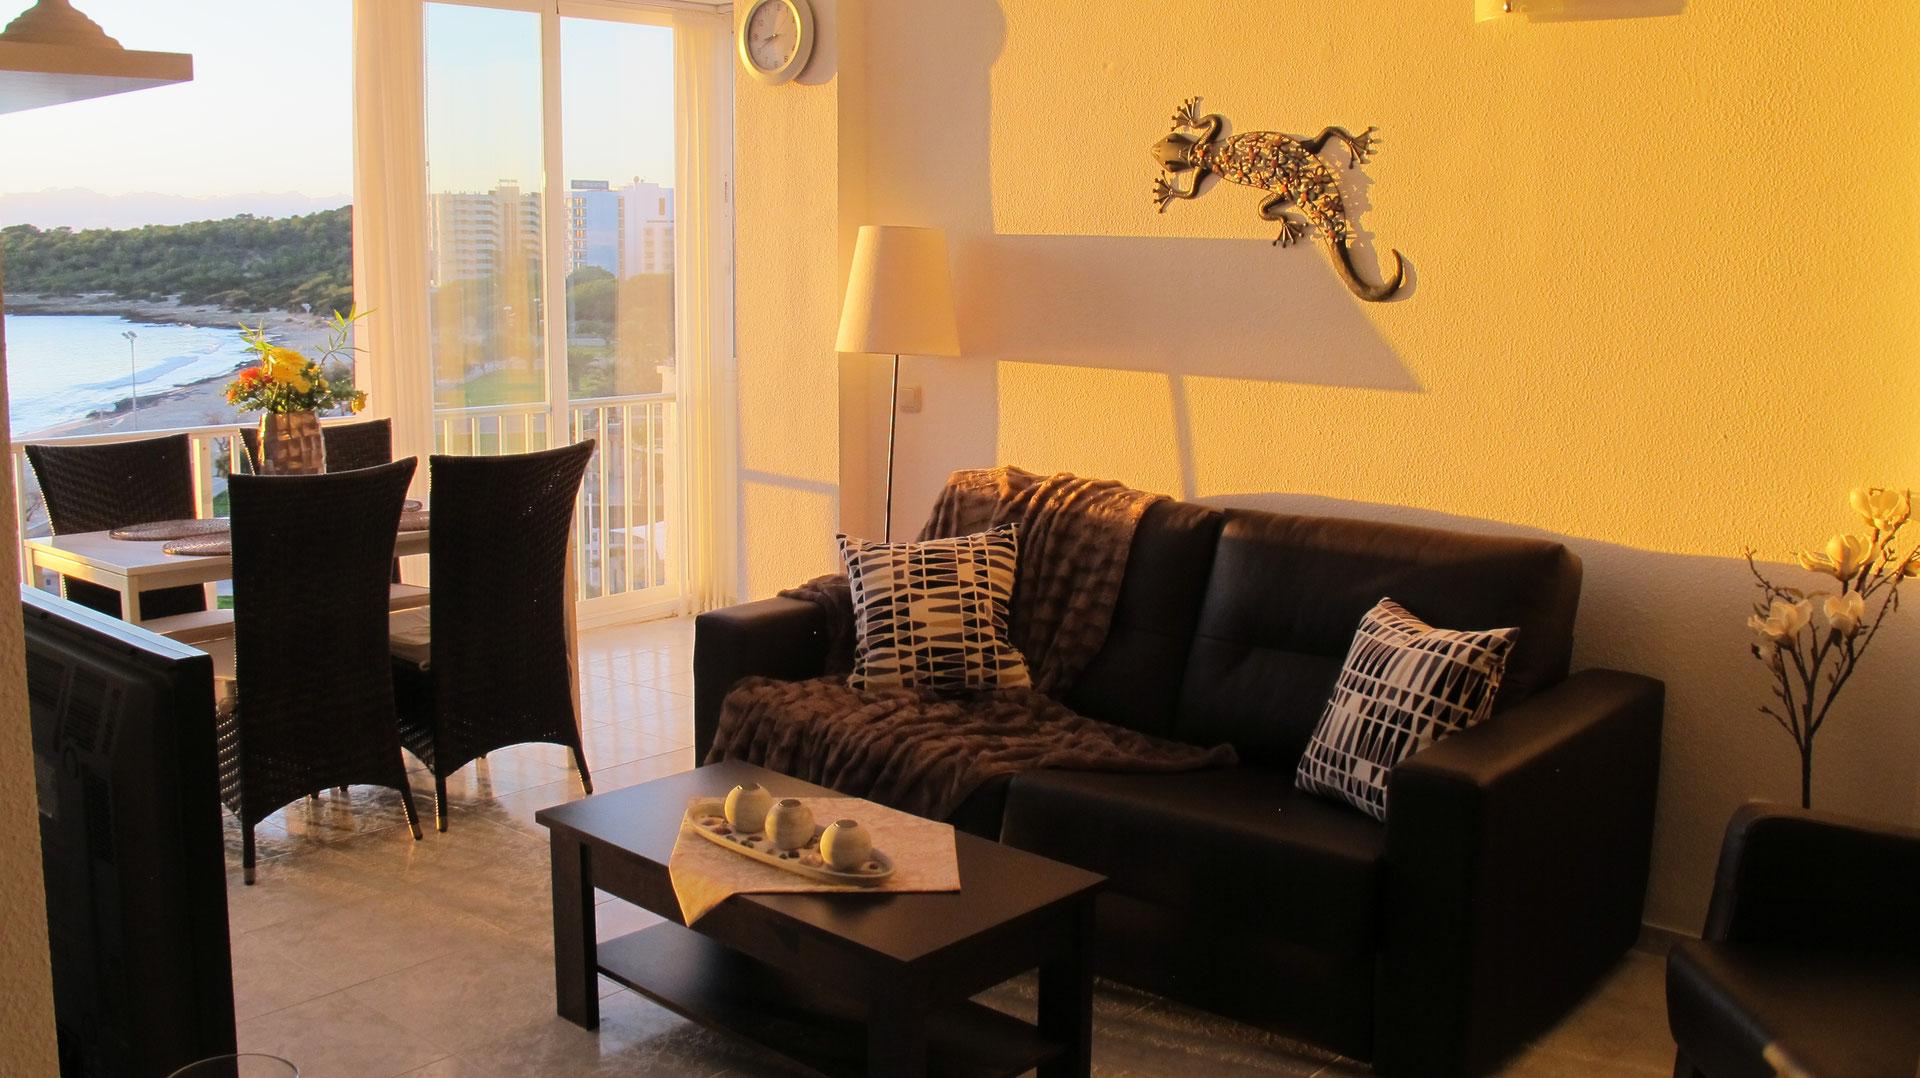 cala millor ferienwohnung calamillors webseite. Black Bedroom Furniture Sets. Home Design Ideas